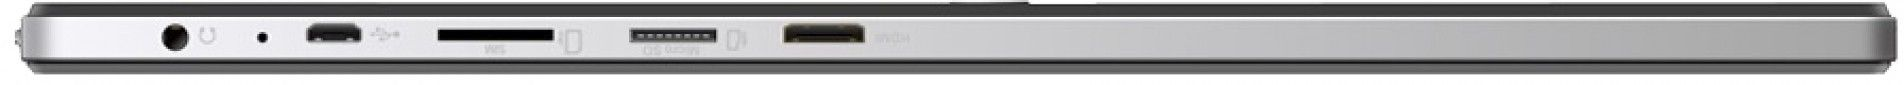 Планшет Prestigio MultiPad 4 Diamond 10.1 3G Black (PMT7177_3G_D_BK) 3